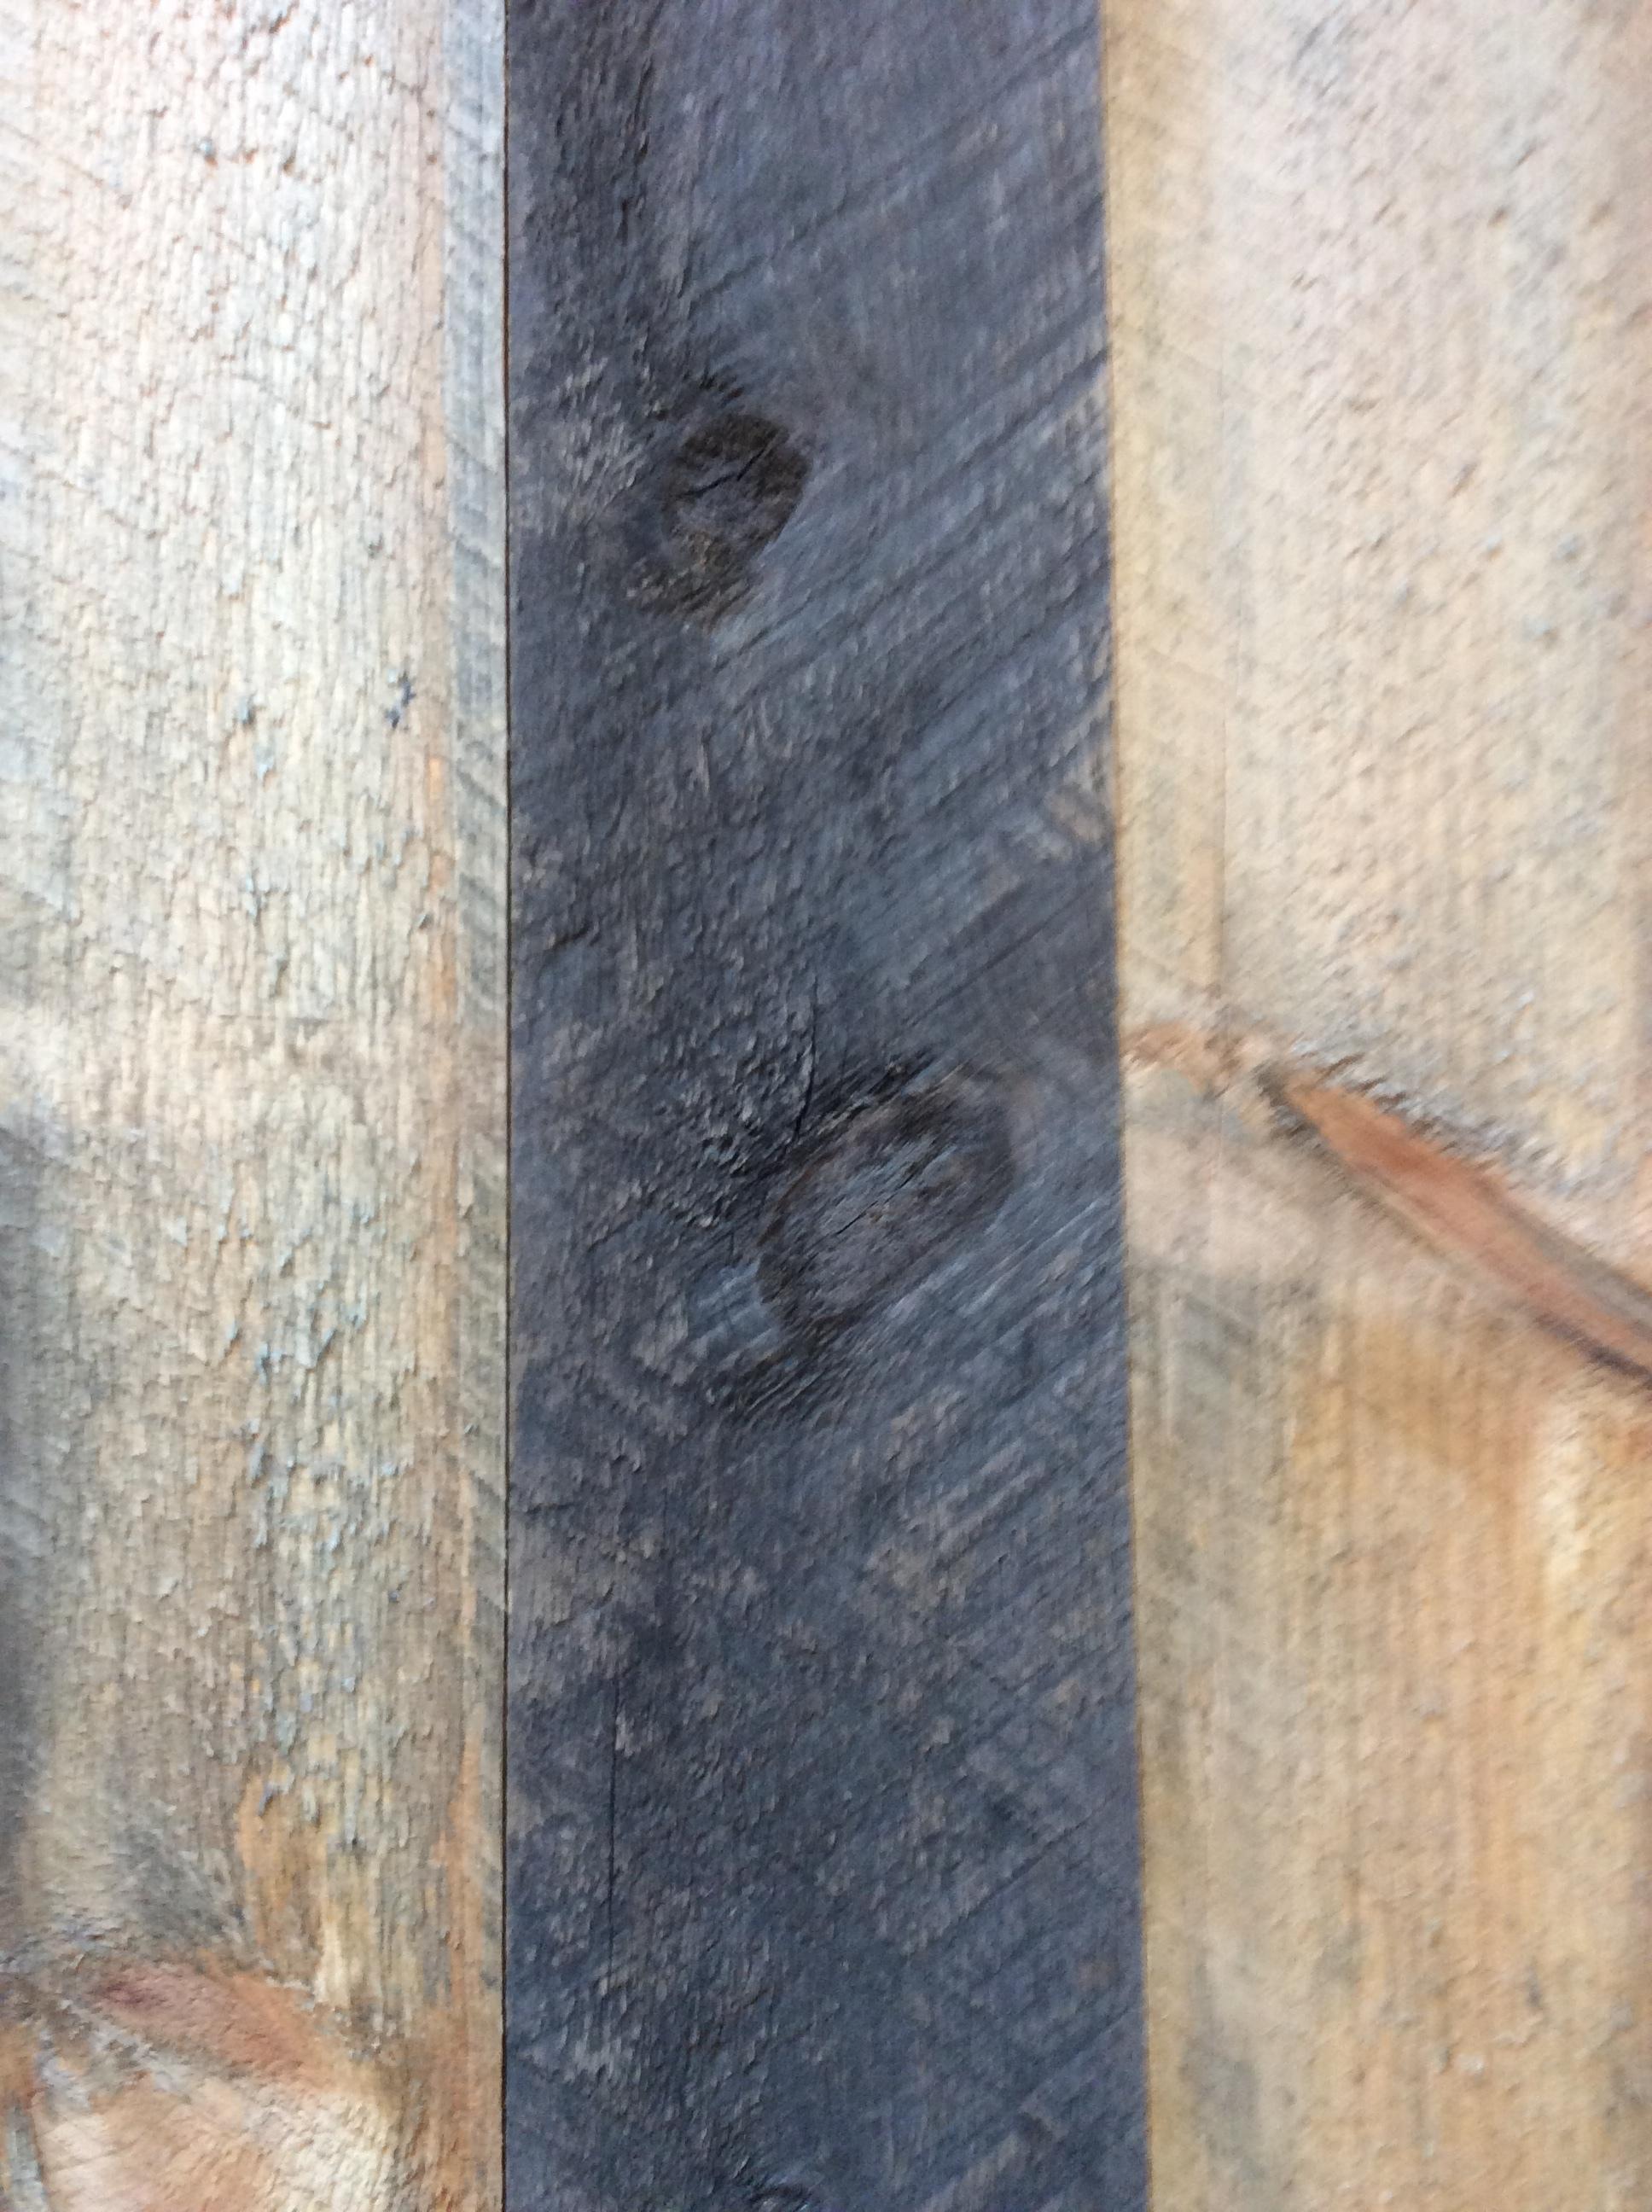 Barn Board Lapped.JPG